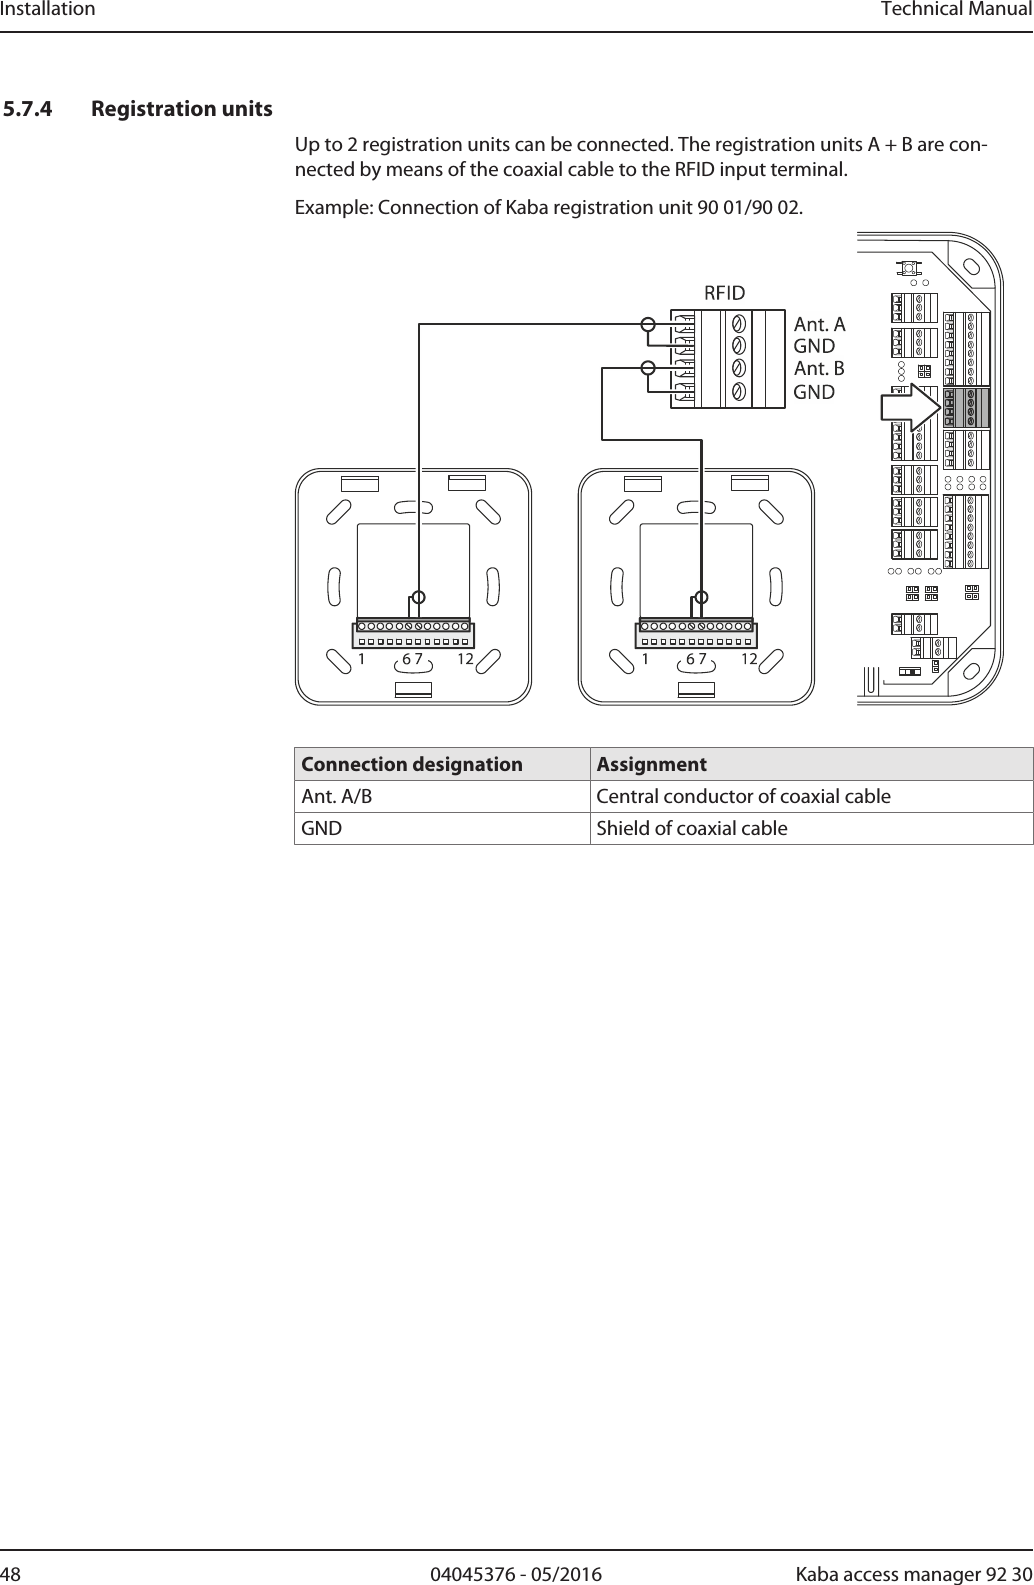 hight resolution of kaba wiring diagrams wiring diagram postdormakaba ead kam9230 k5 rfid reader user manual tm 9230 k5